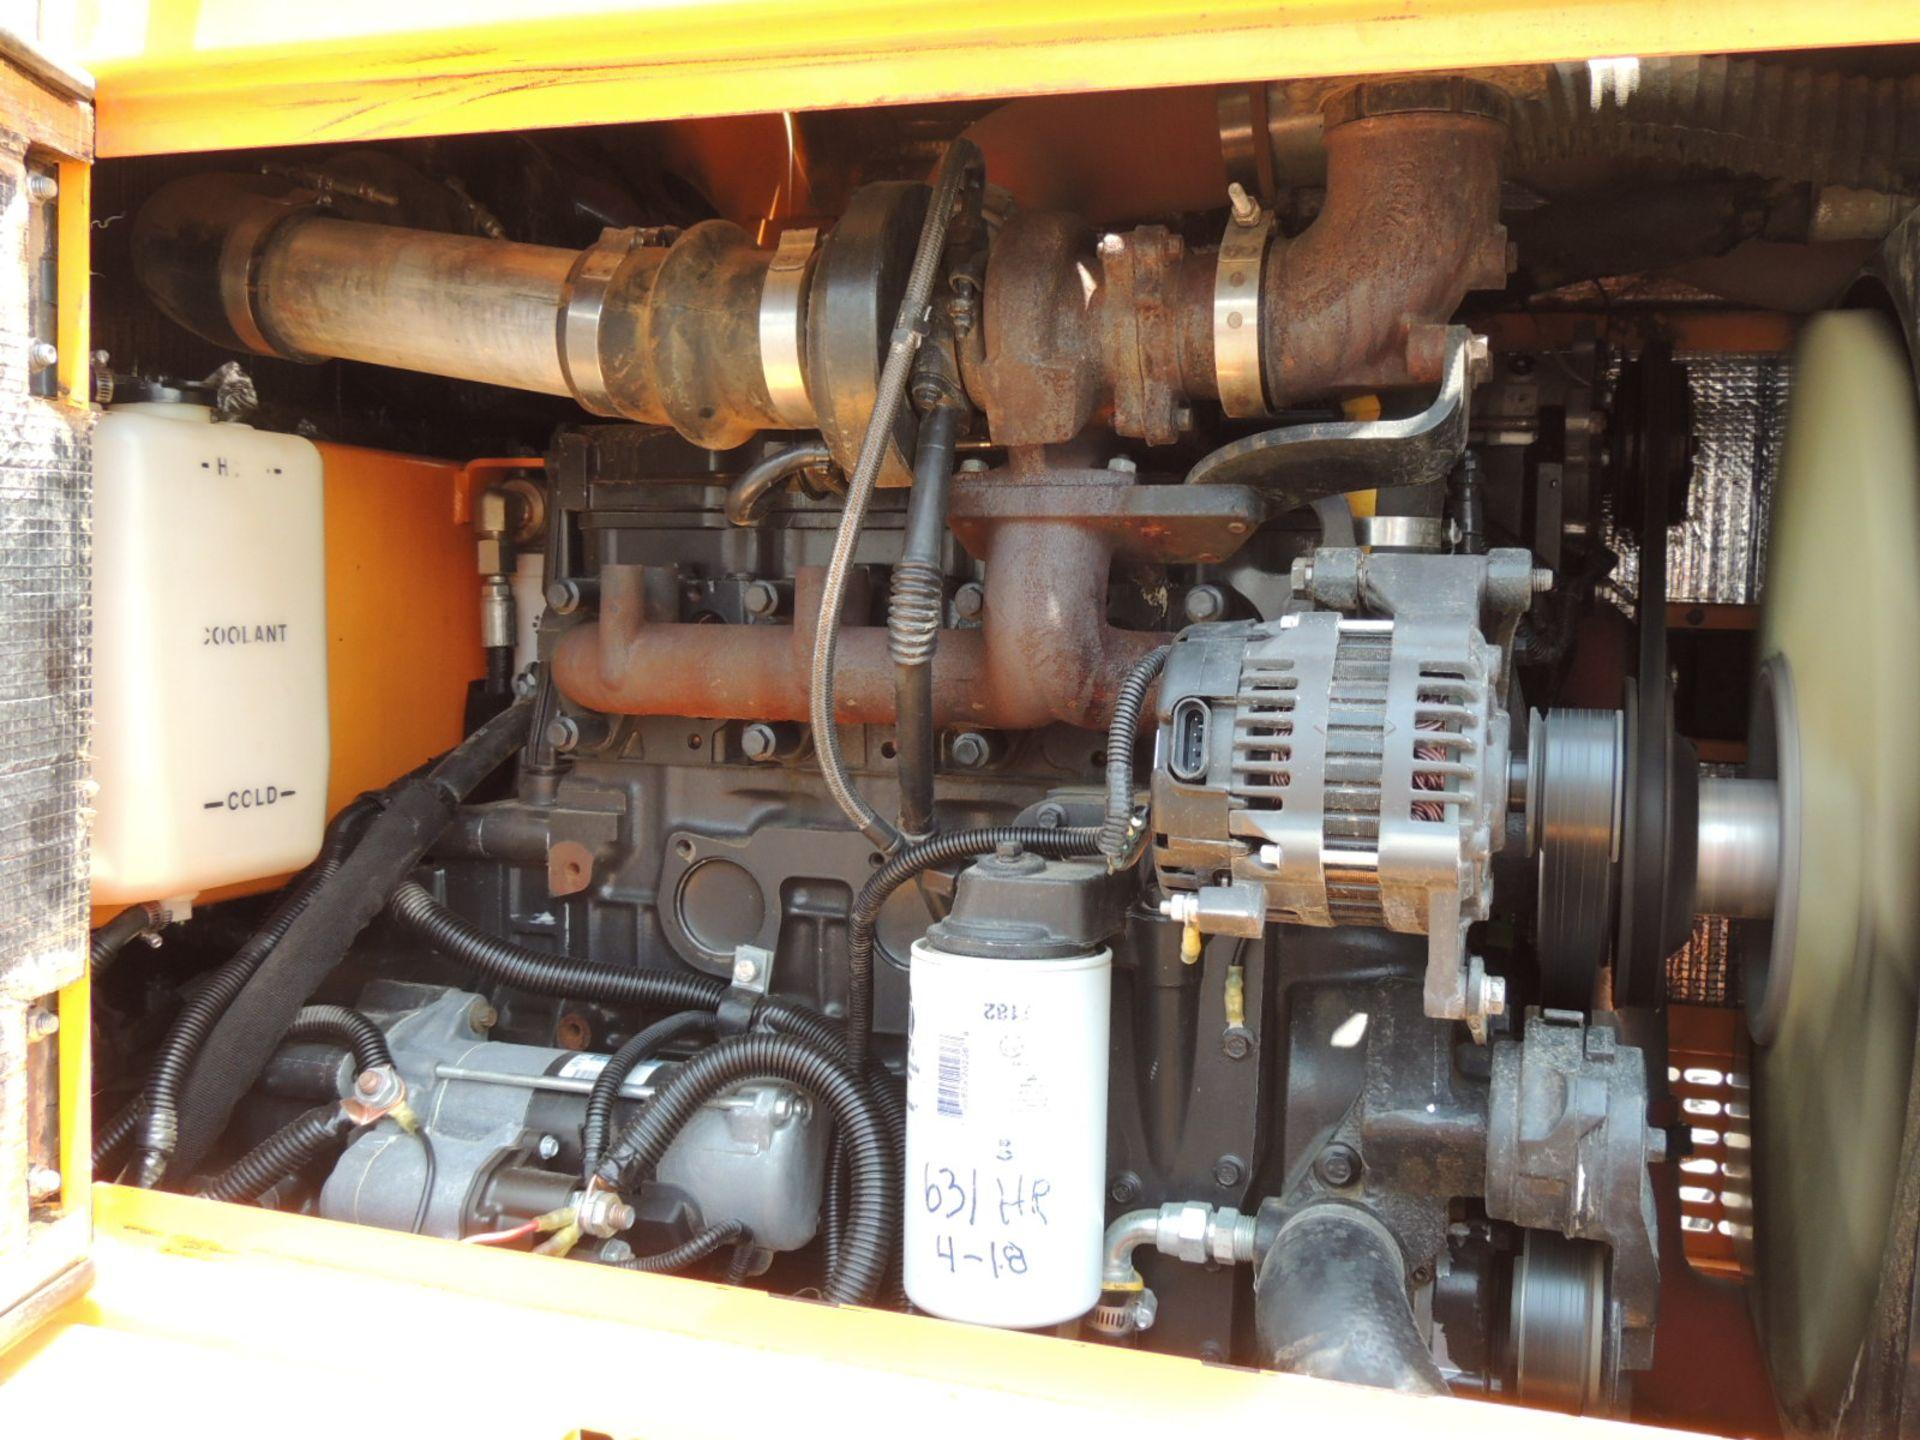 2015 Leeboy 685C Motor Grader, S/N 11909, Rear Ripper w/9-Shank Bar, Includes (5) Shanks, Front - Image 7 of 11